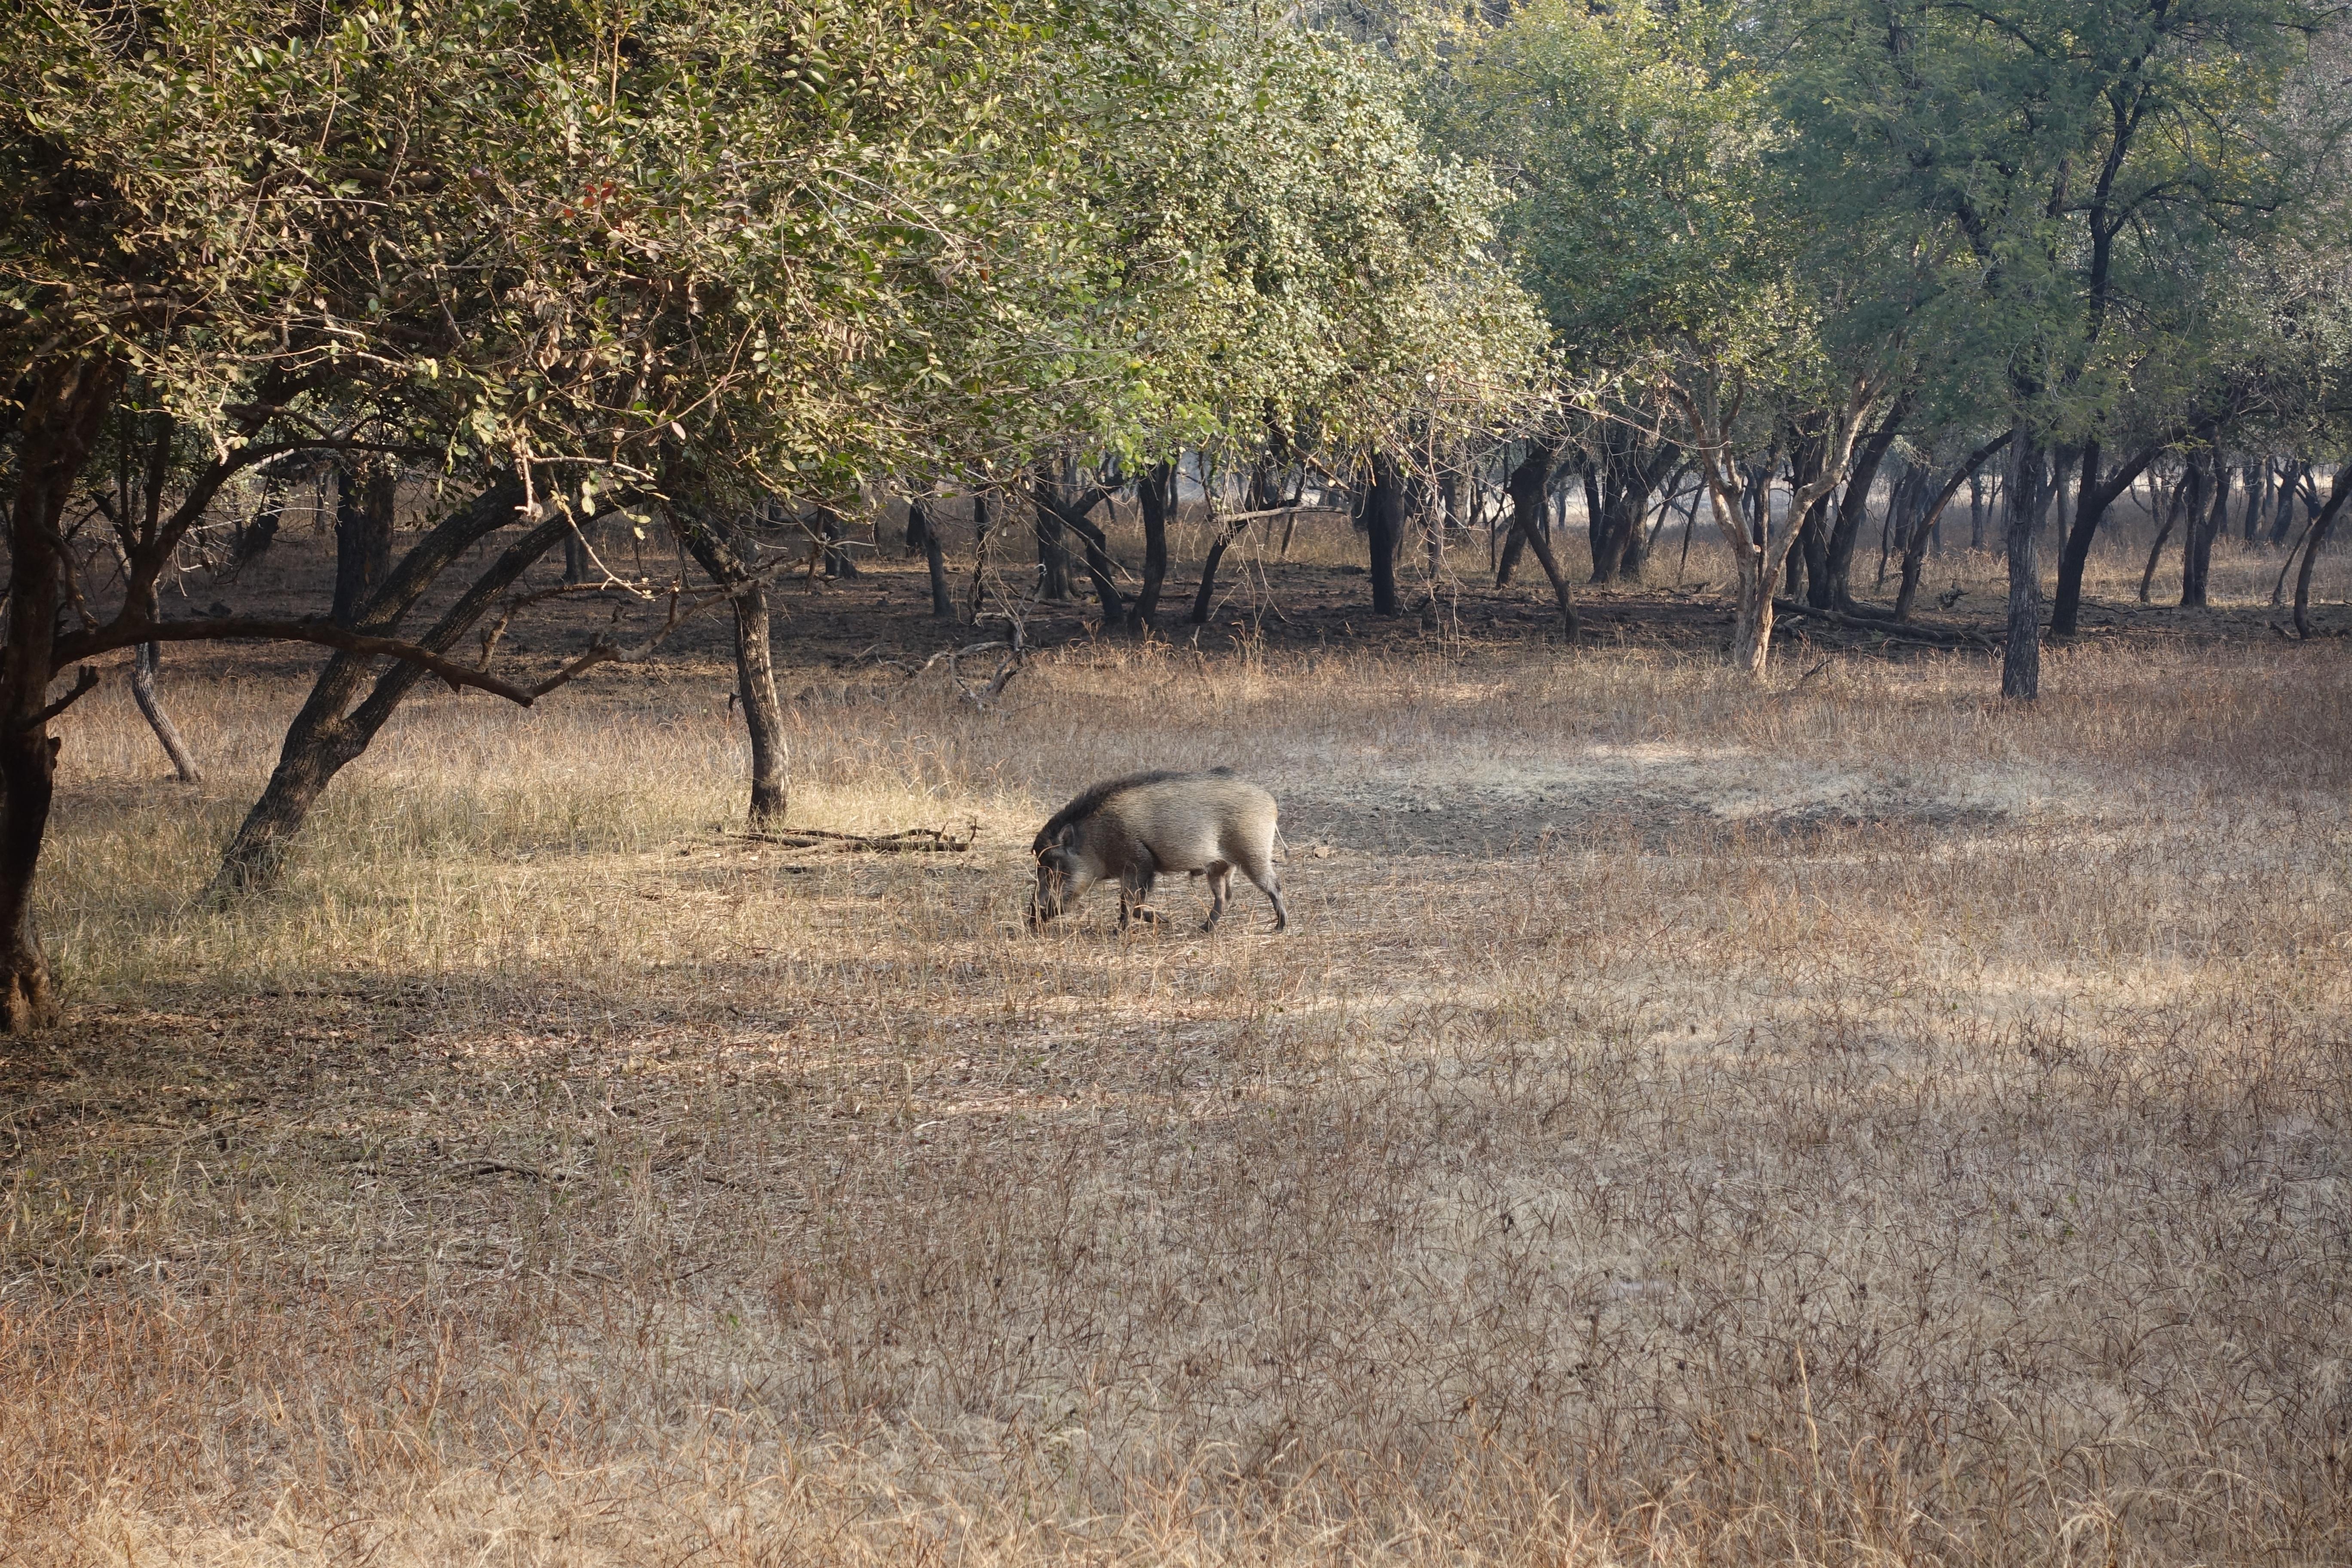 Wild Boar in Ranthambhore National Park - photo by Juliamaud